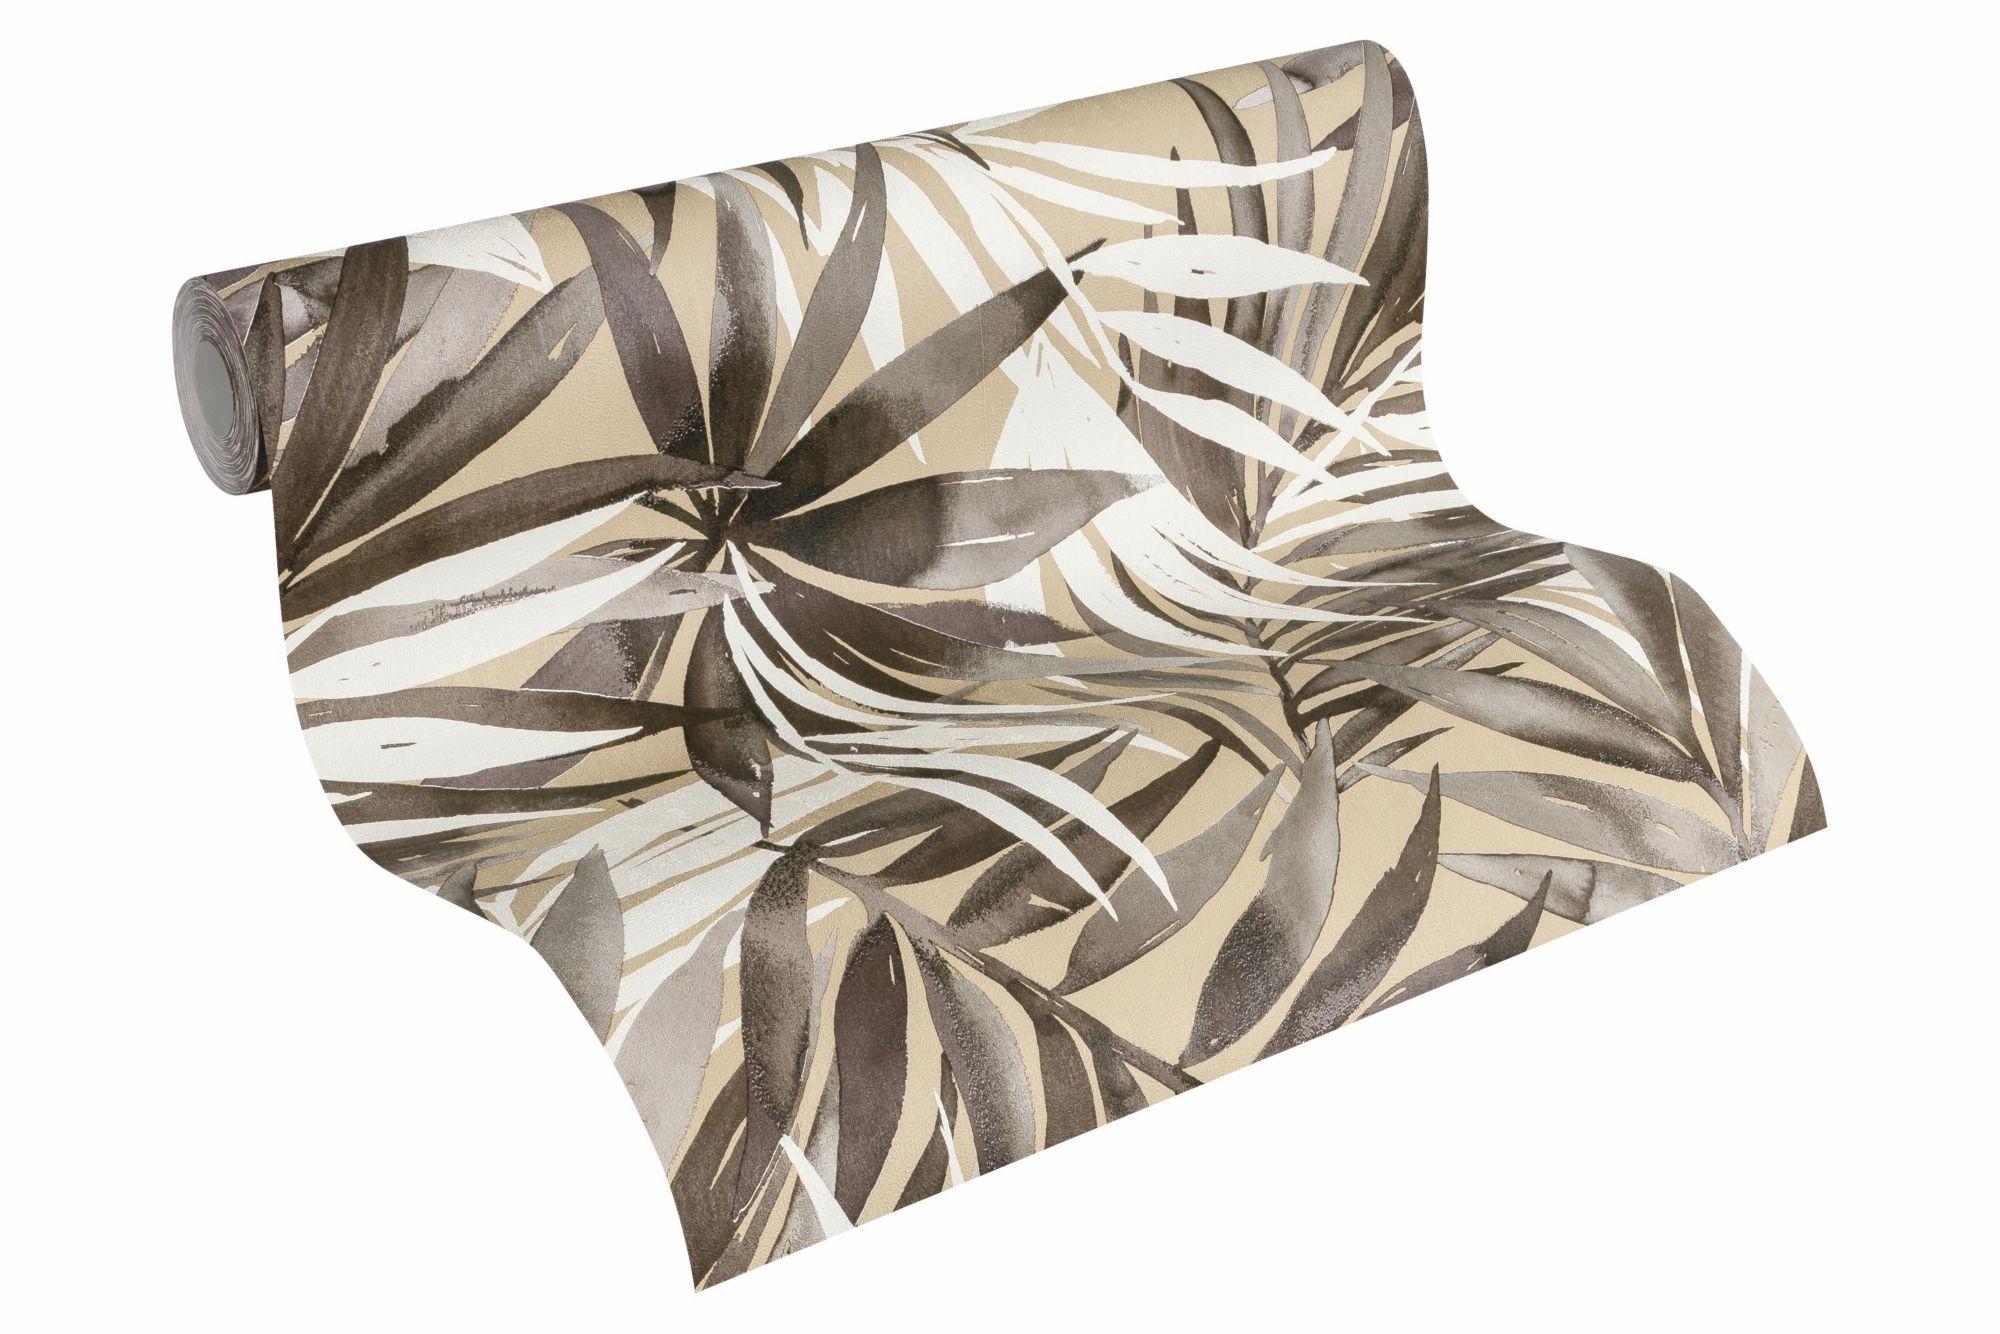 DESIGNDSCHUNGEL BY LAURA N Vliestapete, »Tapete mit Palmenprint Designdschungel by Laura N.«, braungrau, graubeige, weiß